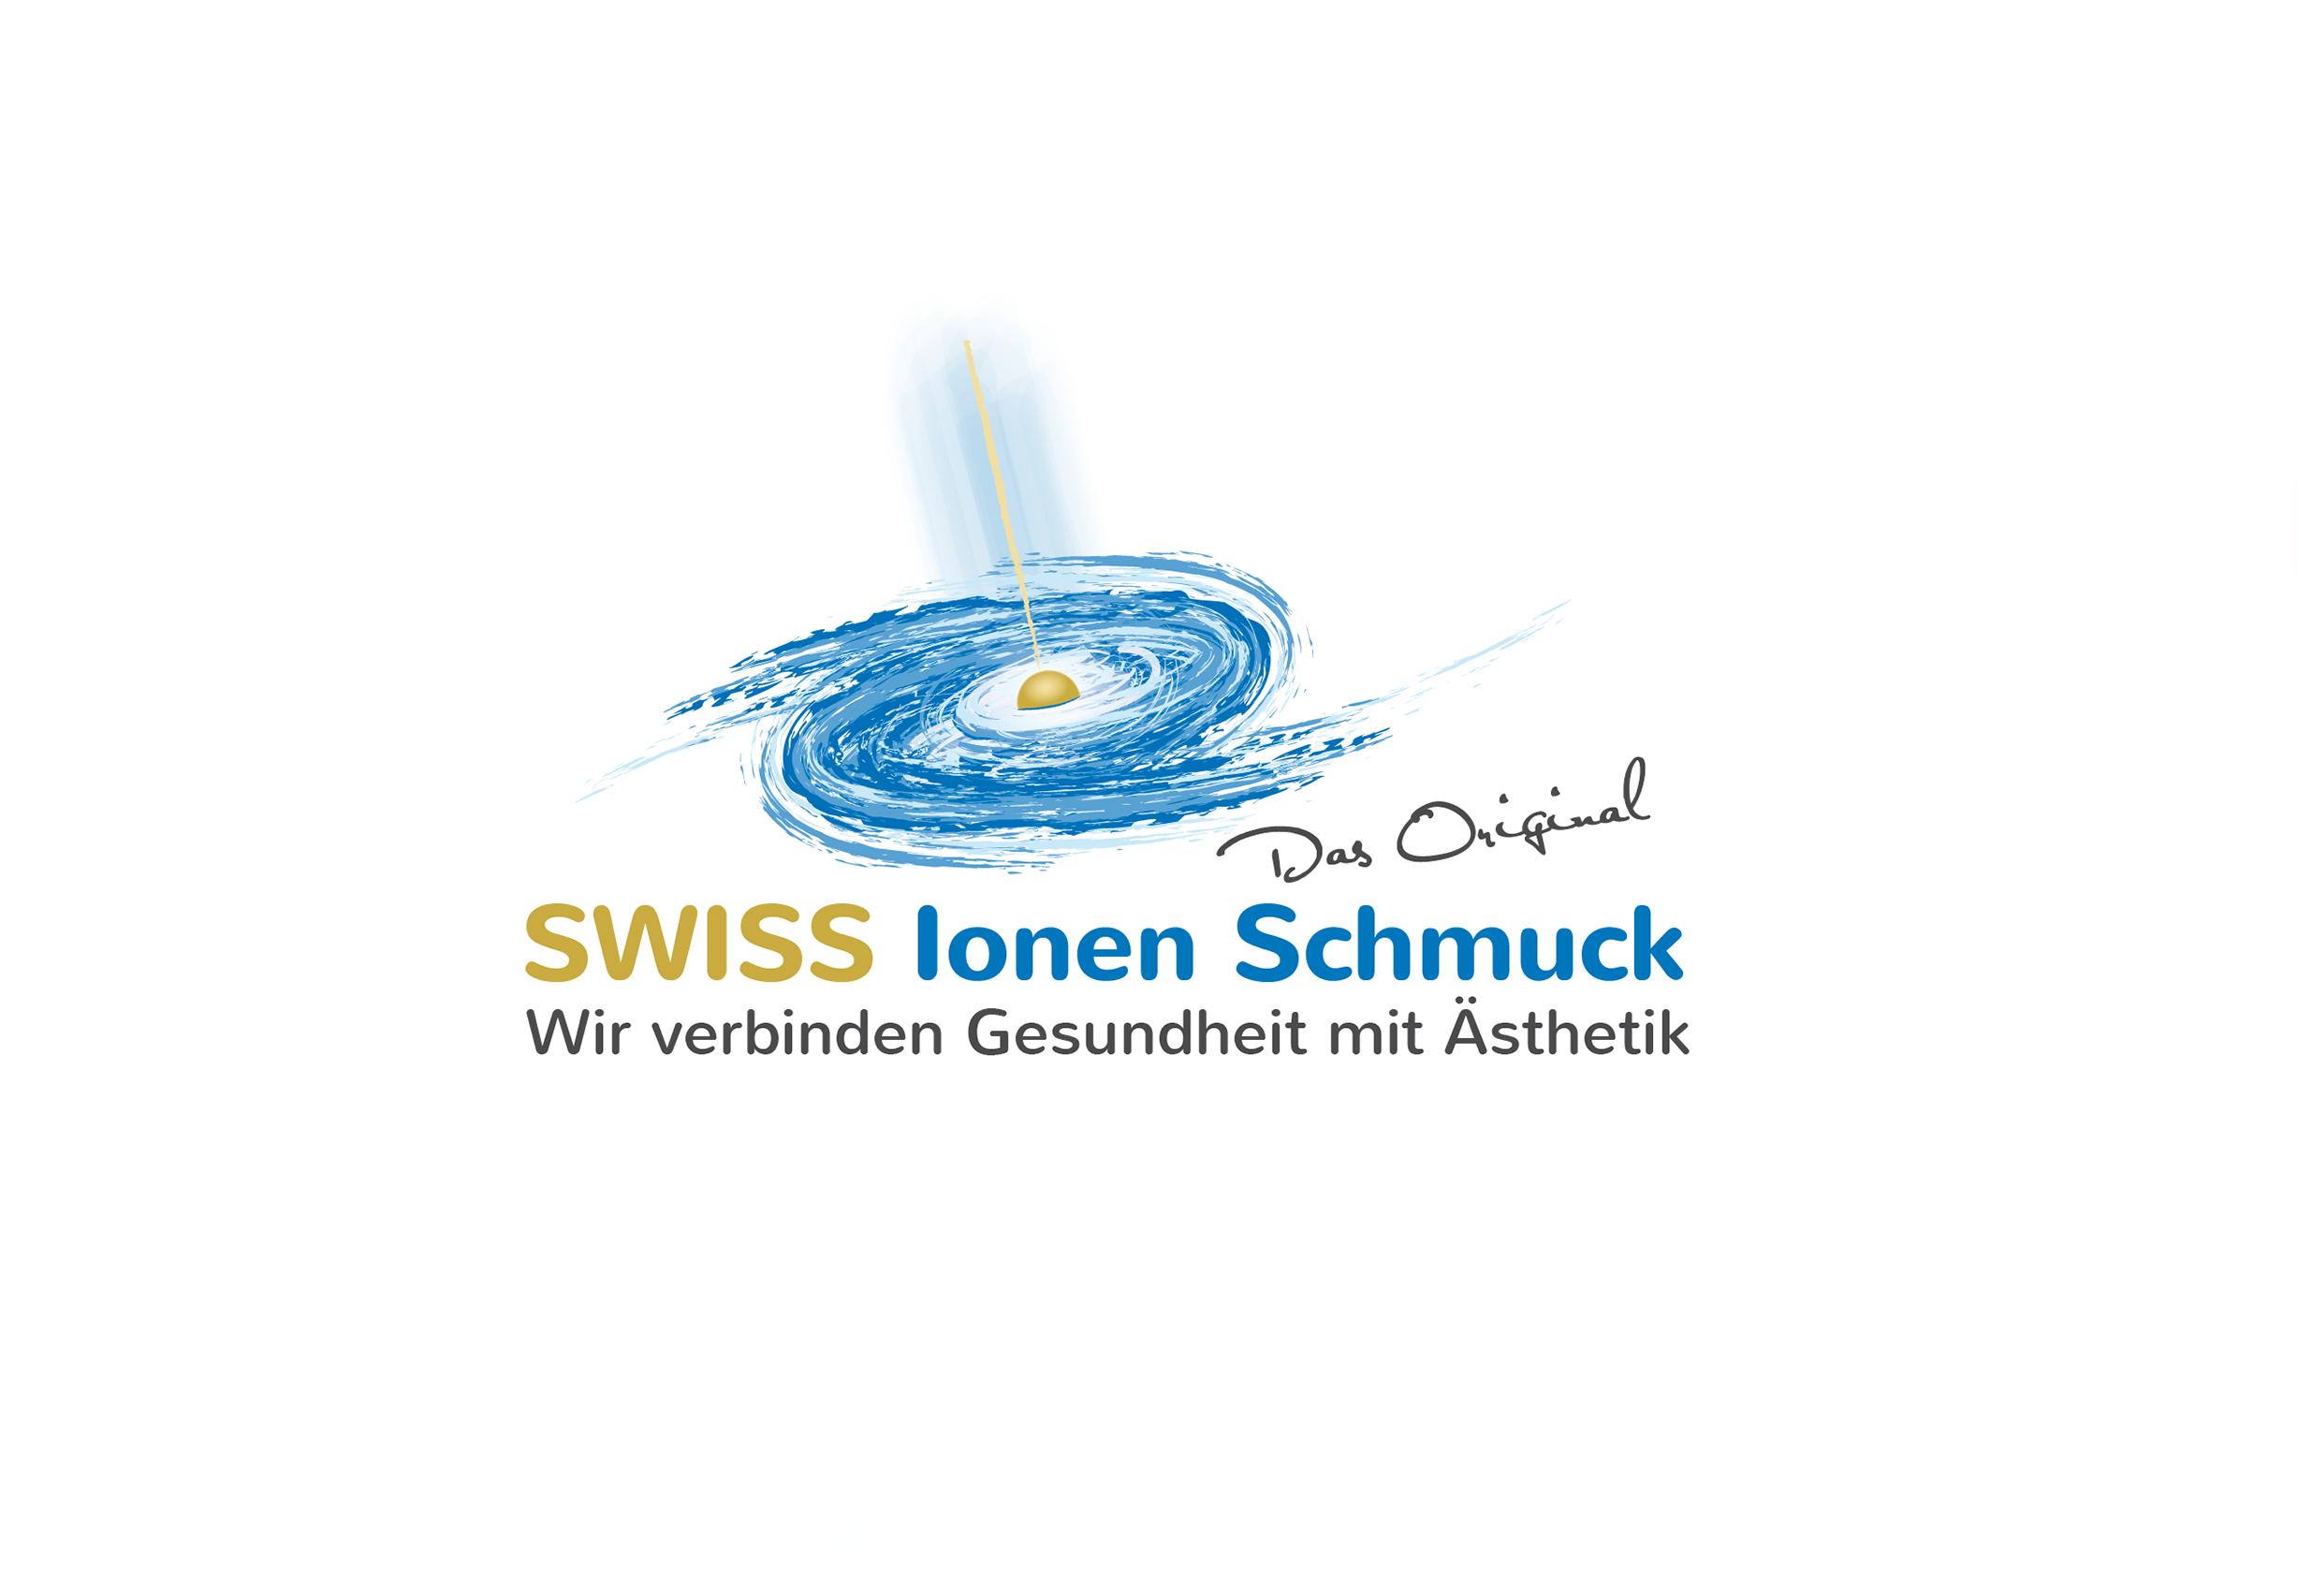 Schmuckdesigner logo